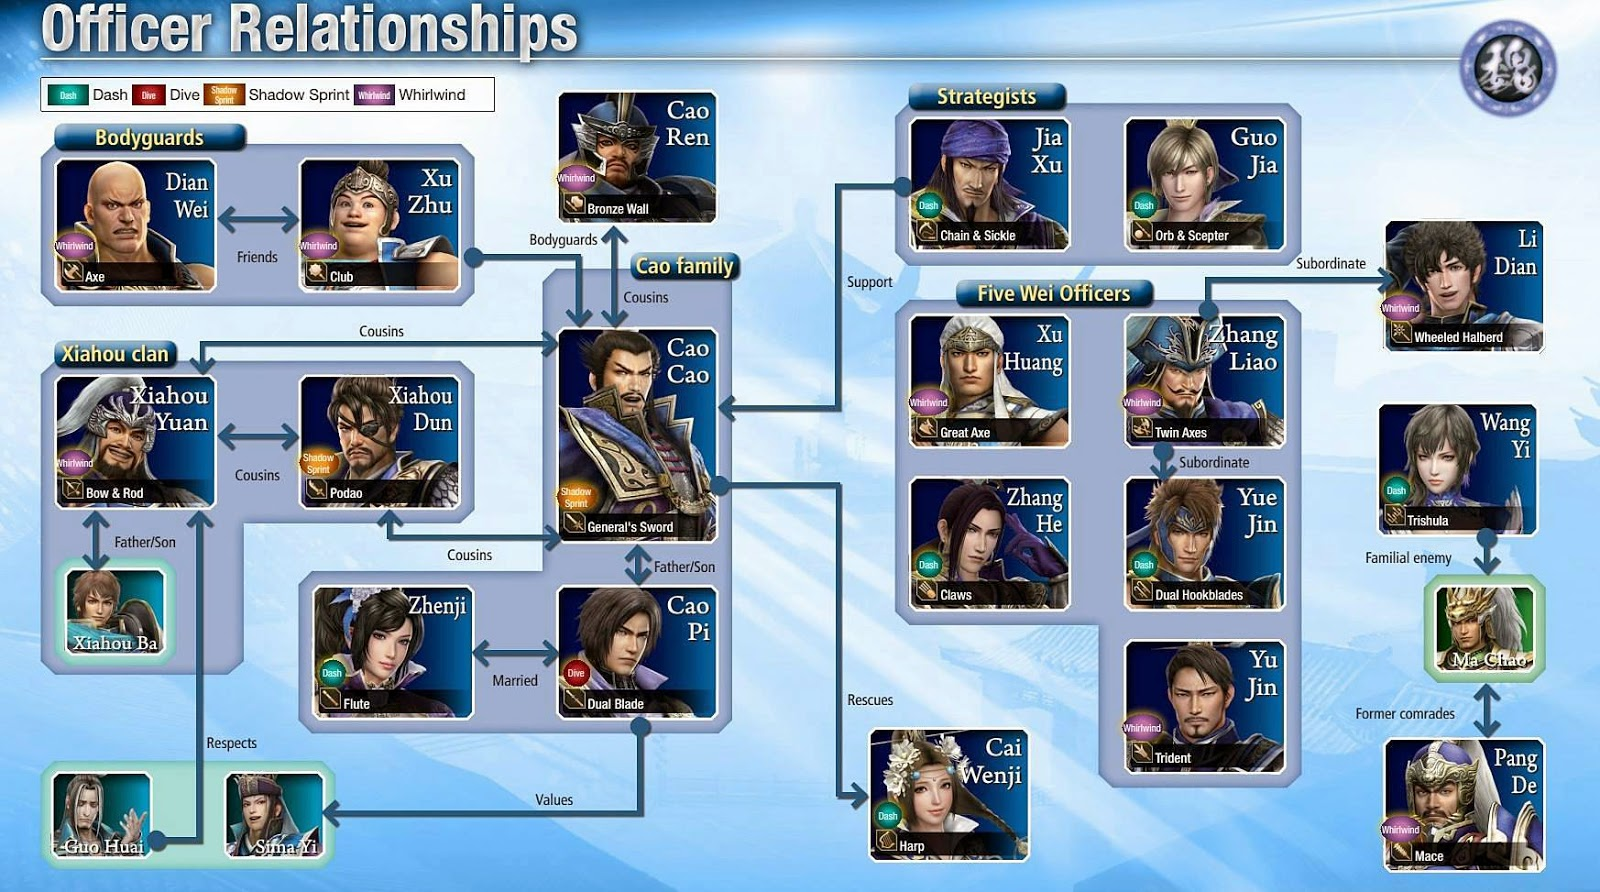 Officer Relationships DW8 : ความสัมพันธ์ของตัวละครสามก๊ก, วุยก๊ก